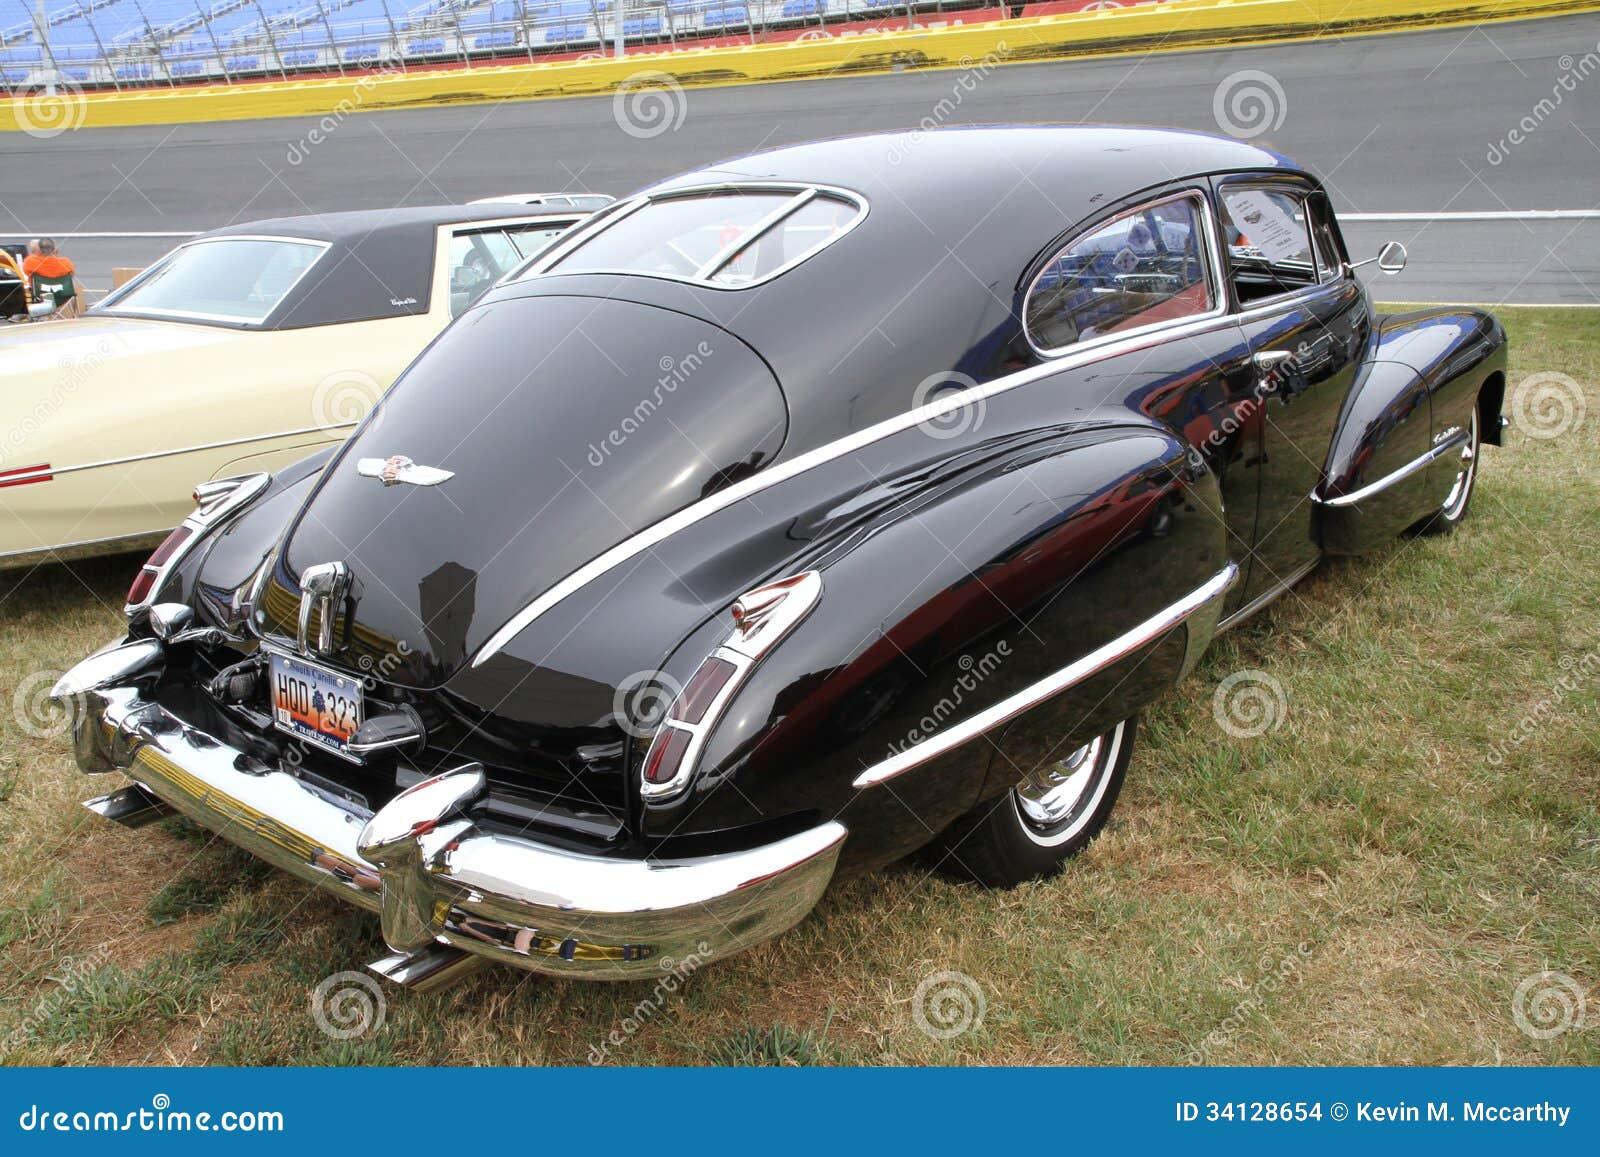 Enterprise Rental Car Charlotte Nc: Classic Cadillac Automobile Editorial Stock Image